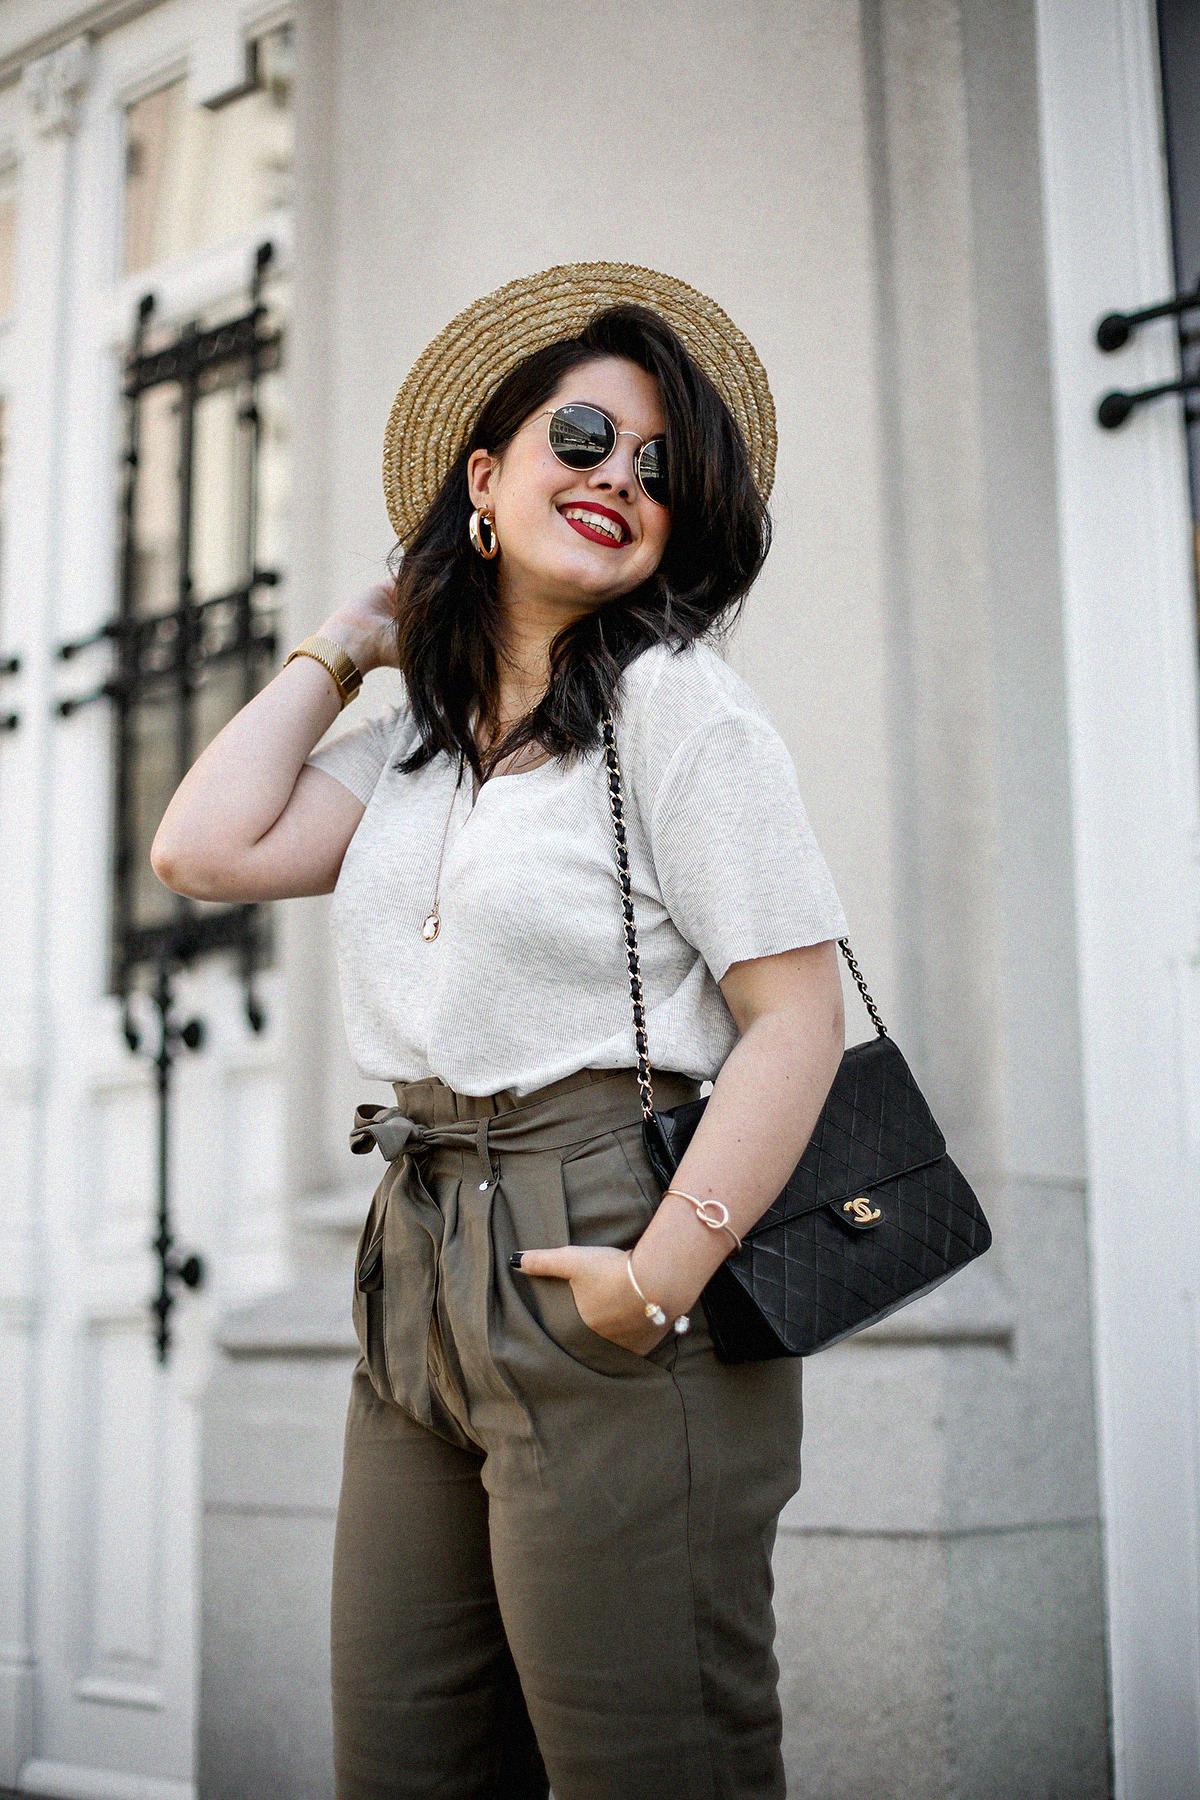 pantalones-verdes-altos-palas-borlas-zara-canotier-look-myblueberrynightsblog15